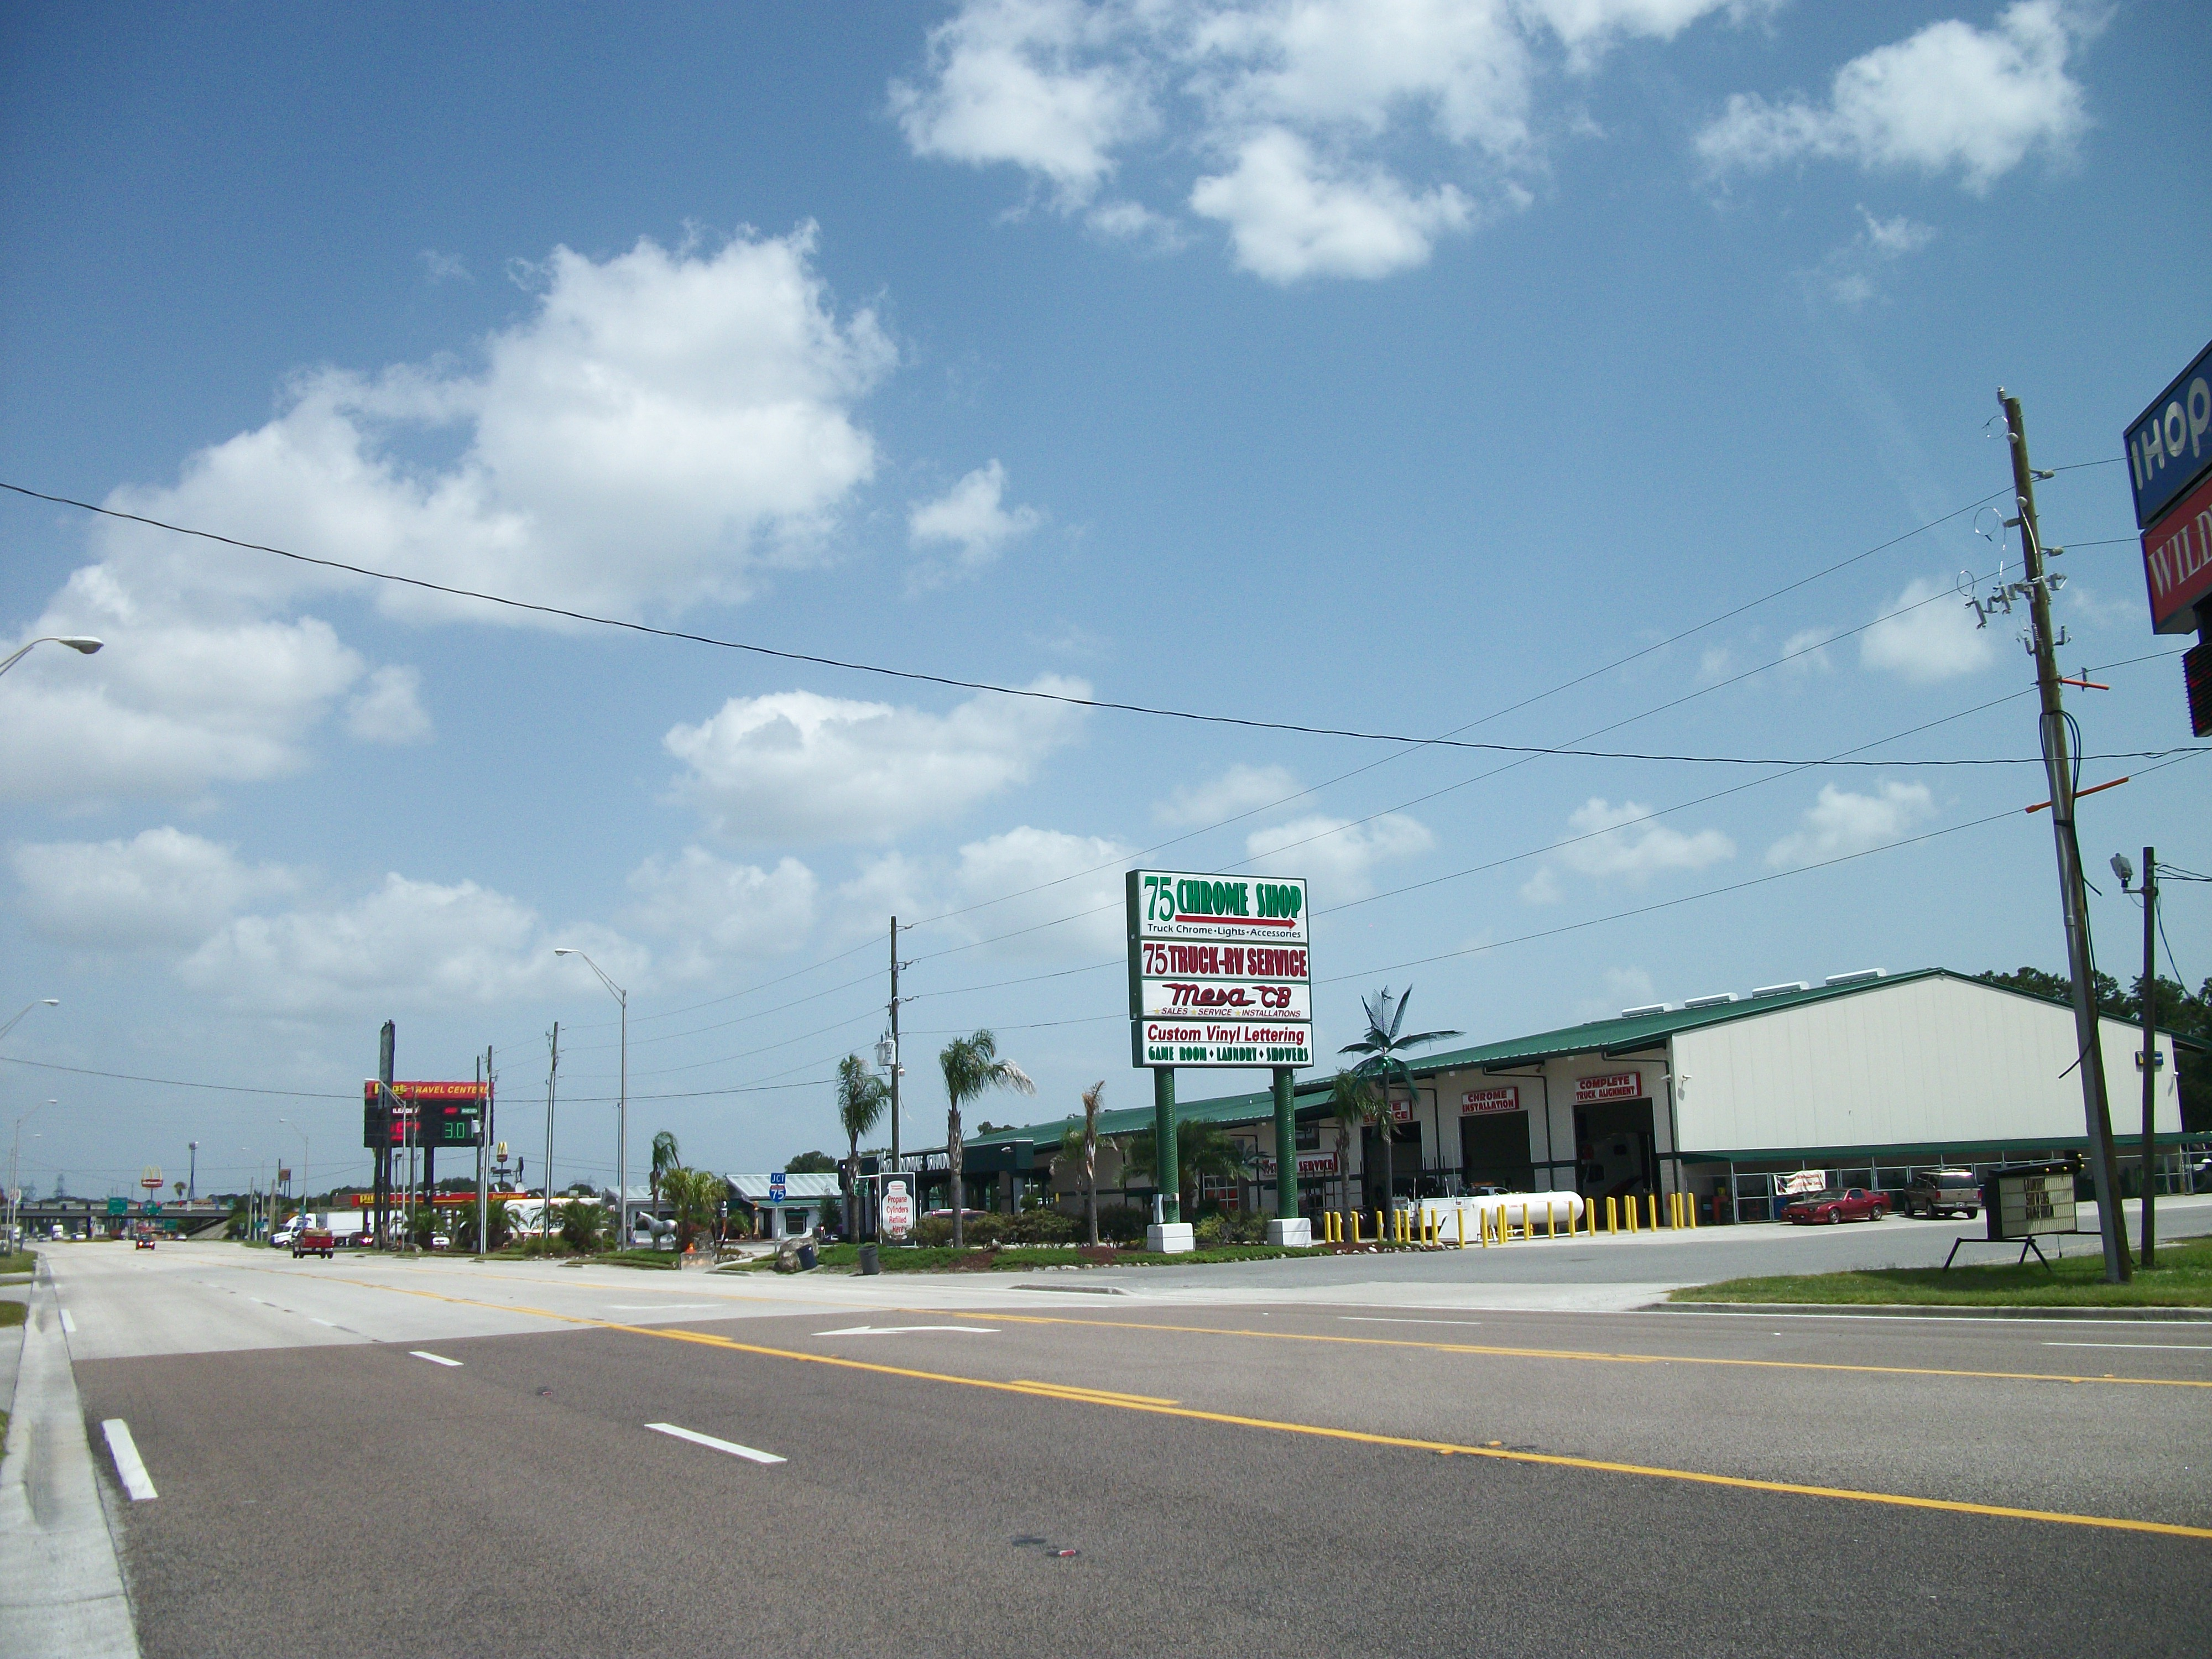 Truck Accessories Florida >> File:75 Chrome Shop; Wildwood, FL.JPG - Wikimedia Commons